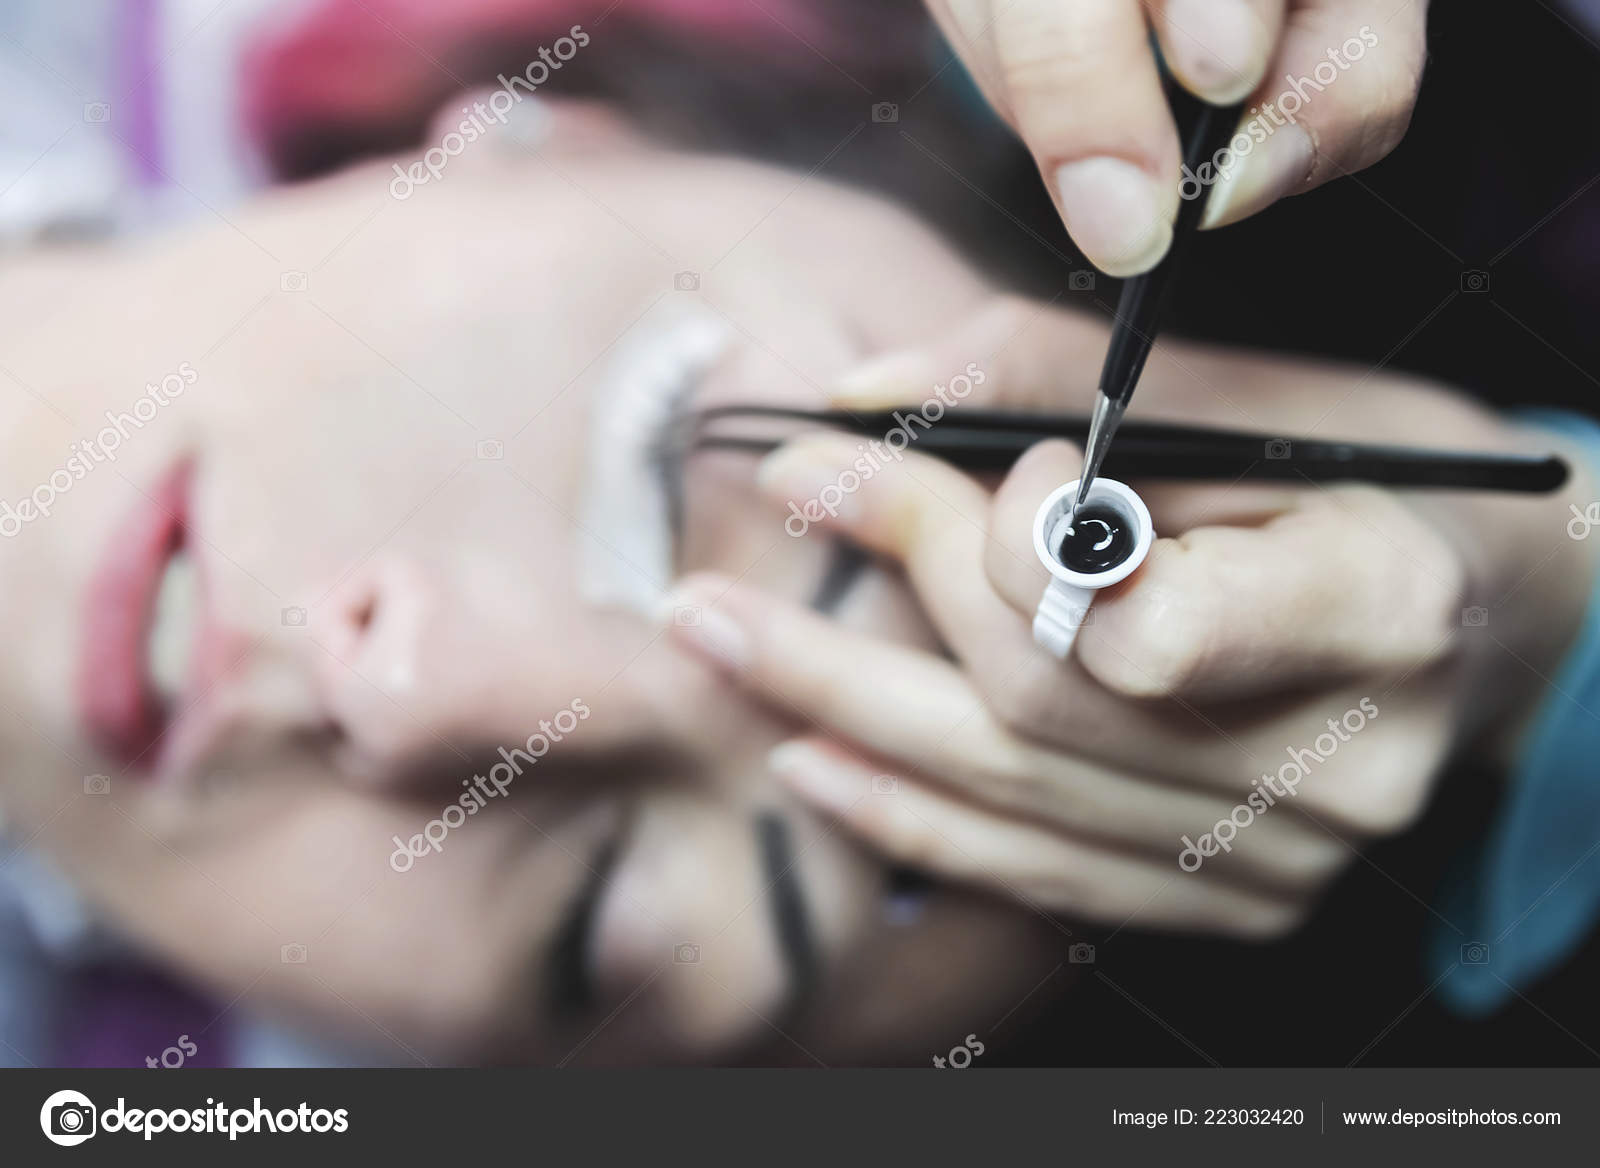 d56de9ad3bf Young Woman Putting False Lashes Beauty Salon — Stock Photo ...